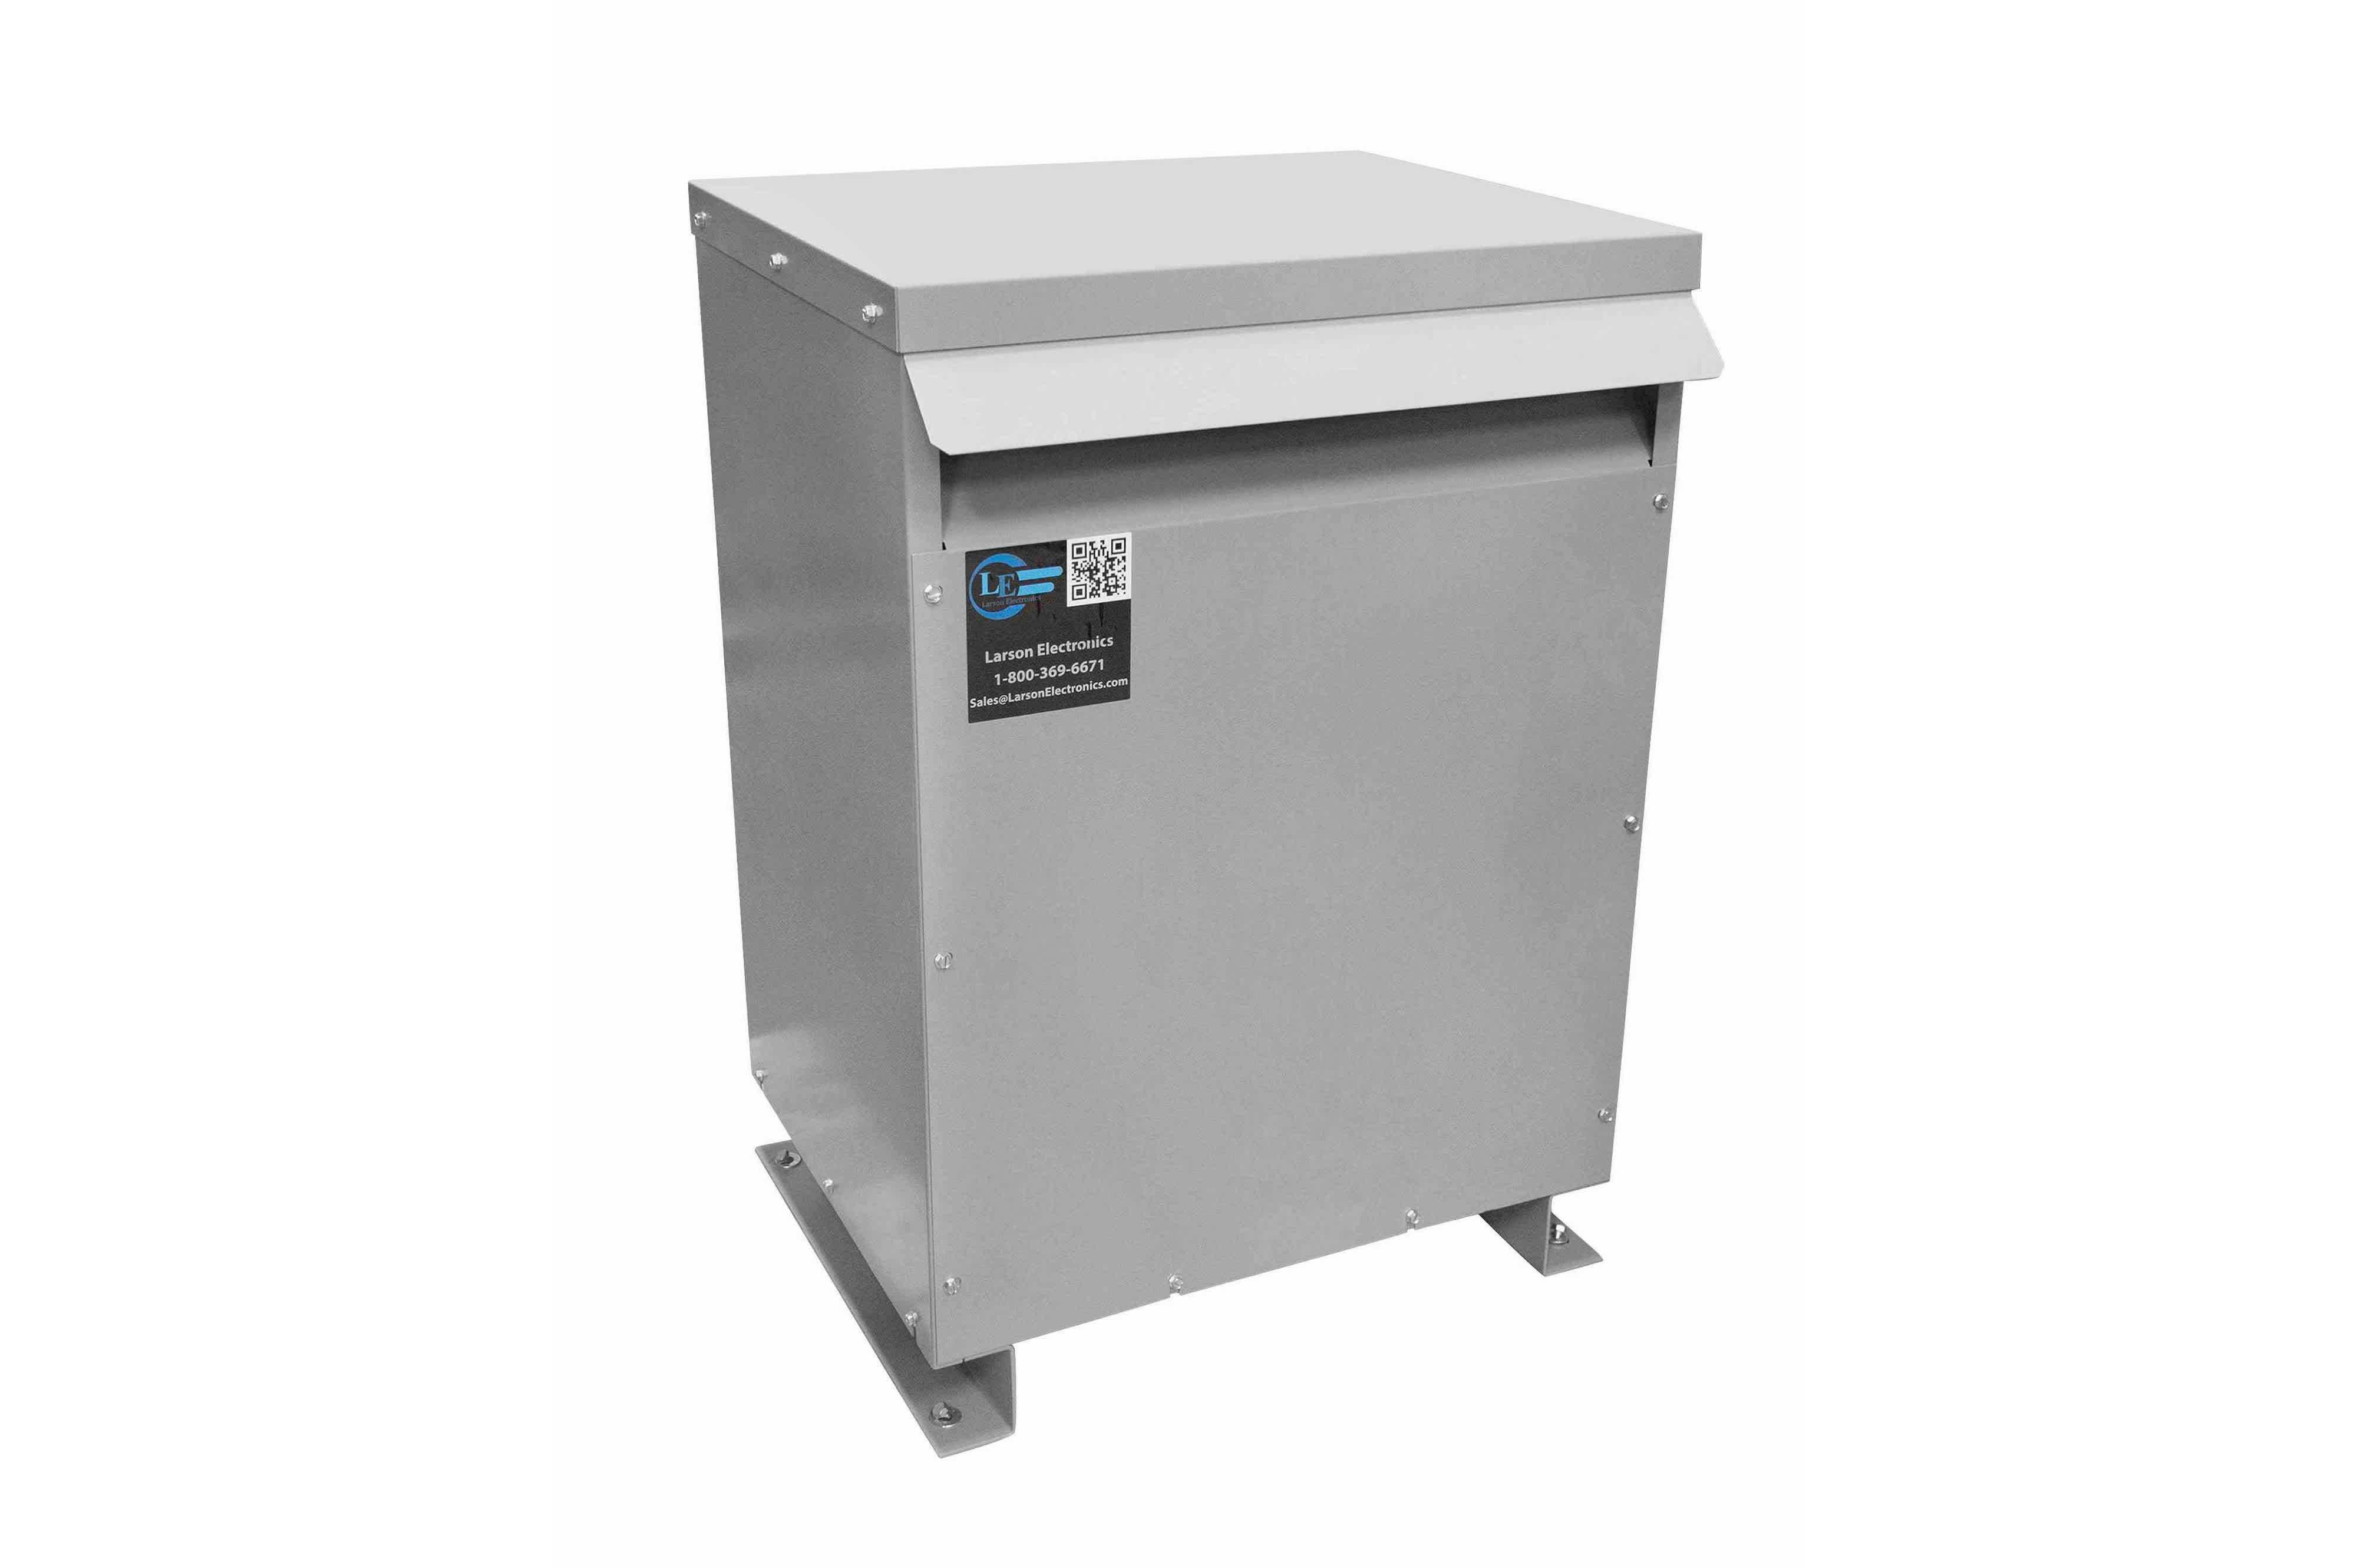 300 kVA 3PH Isolation Transformer, 240V Wye Primary, 415Y/240 Wye-N Secondary, N3R, Ventilated, 60 Hz